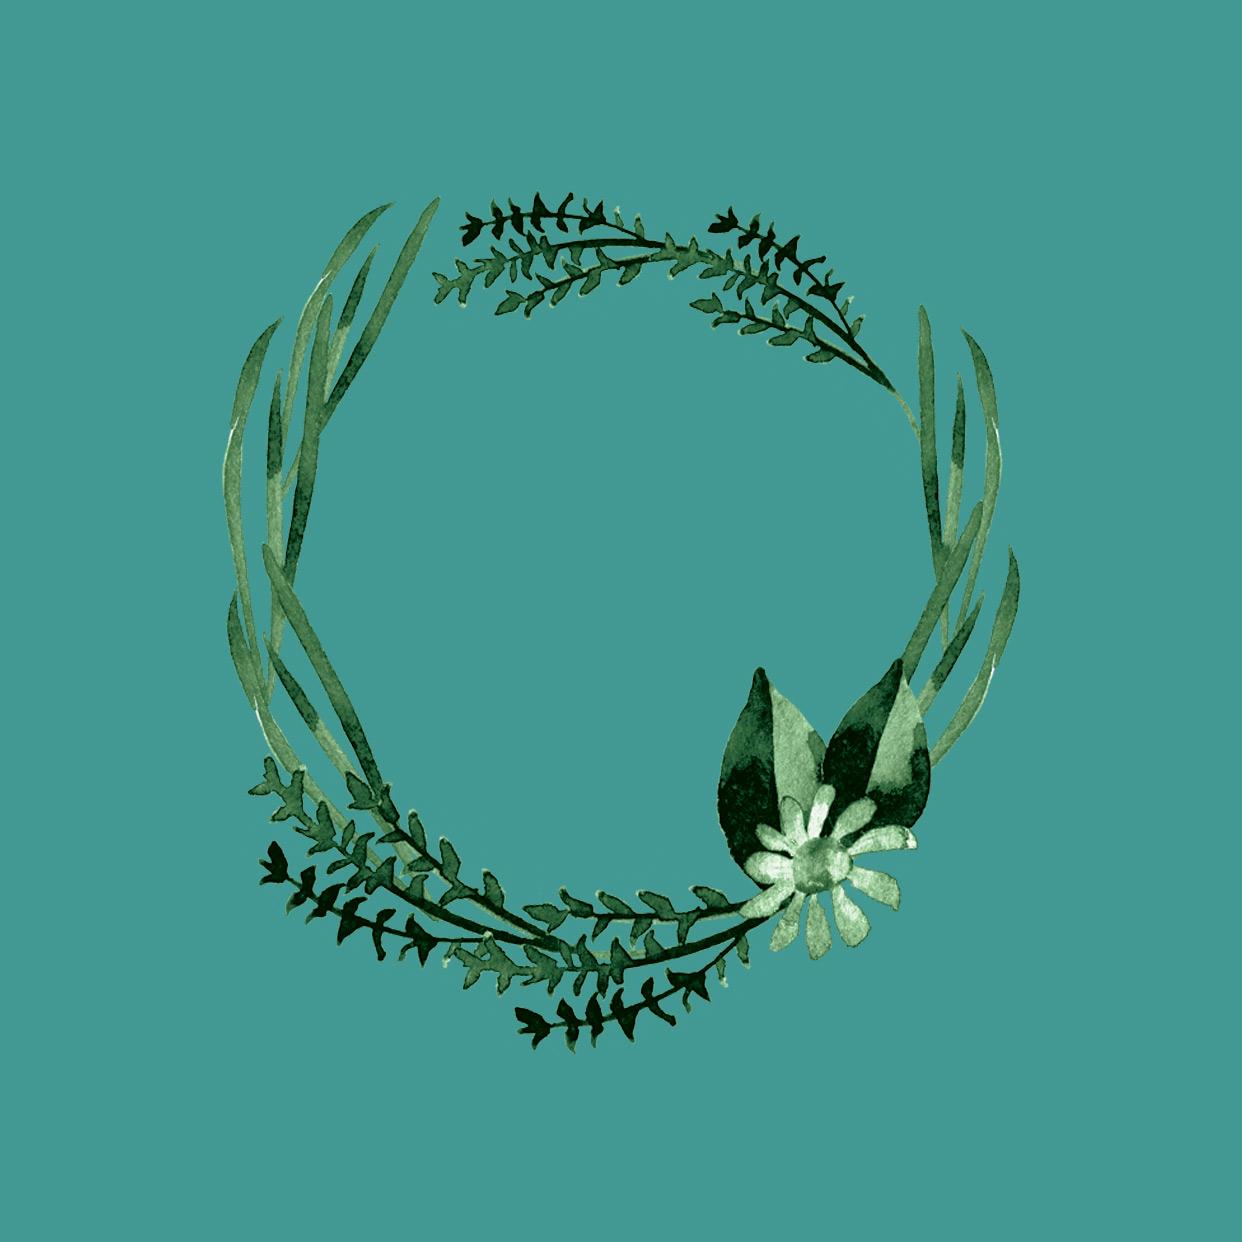 green wreath on turquoise.jpg